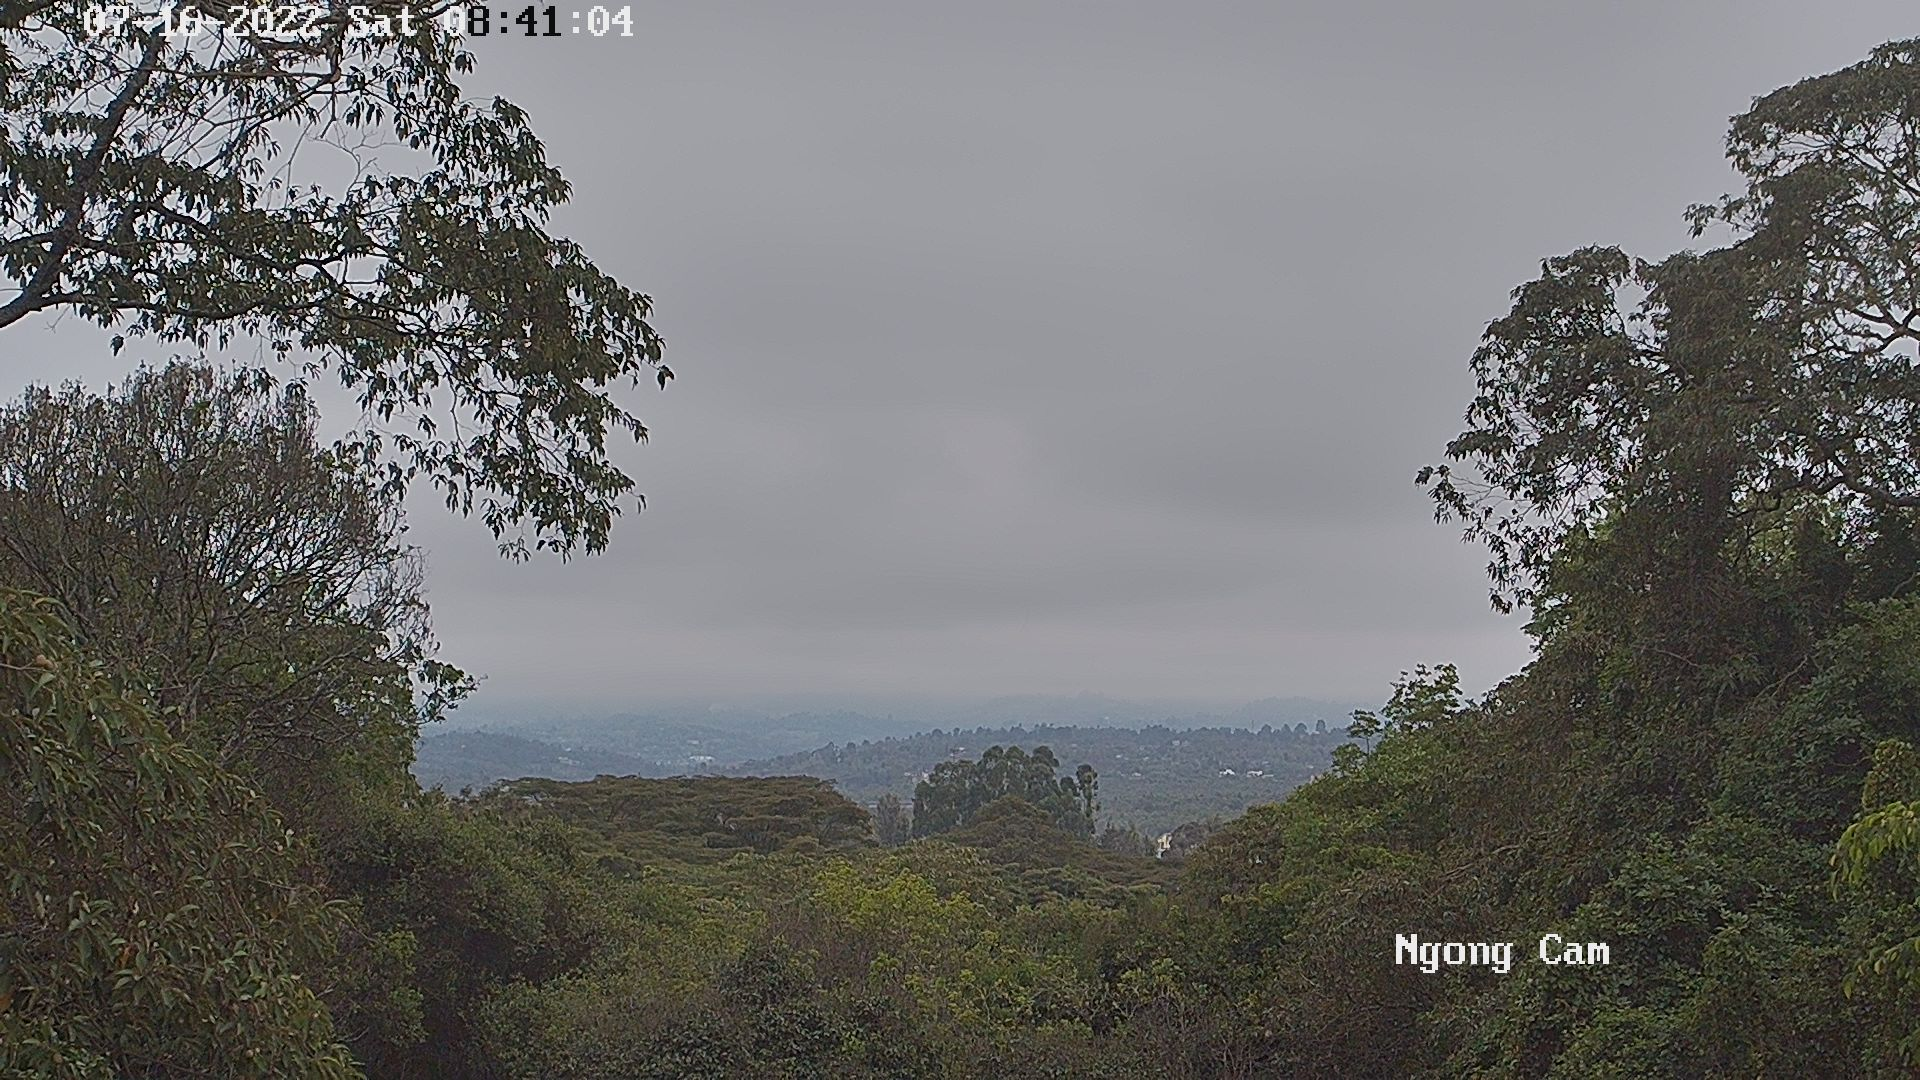 Mount Longonot Mi. 08:47